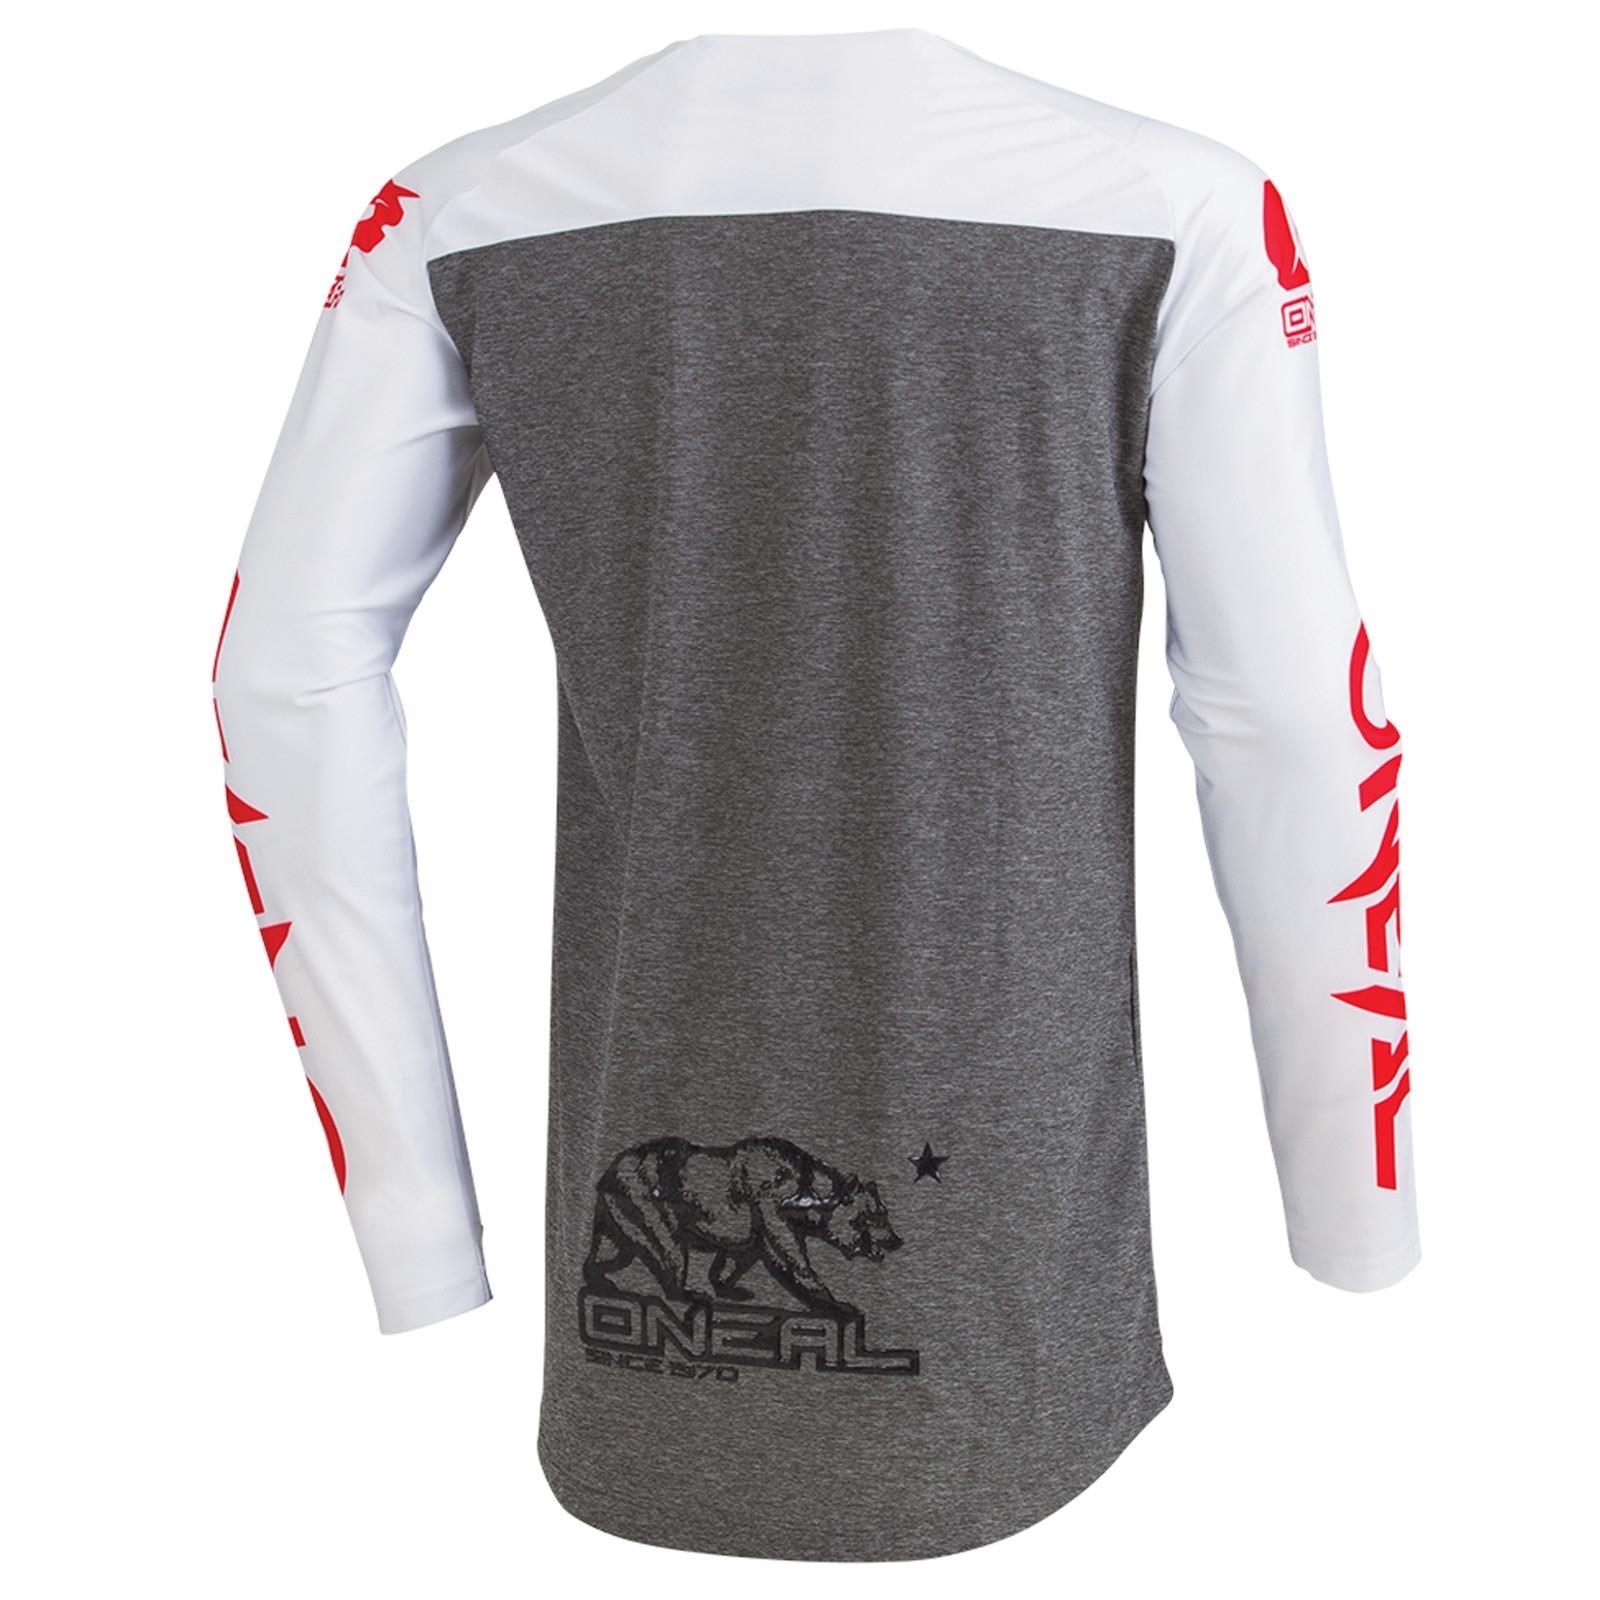 O-039-Neal-elemento-Mayhem-JERSEY-Racewear-Motocross-Maglia-MX-DH-FR-MTB-MOUNTAIN-BIKE miniatura 52